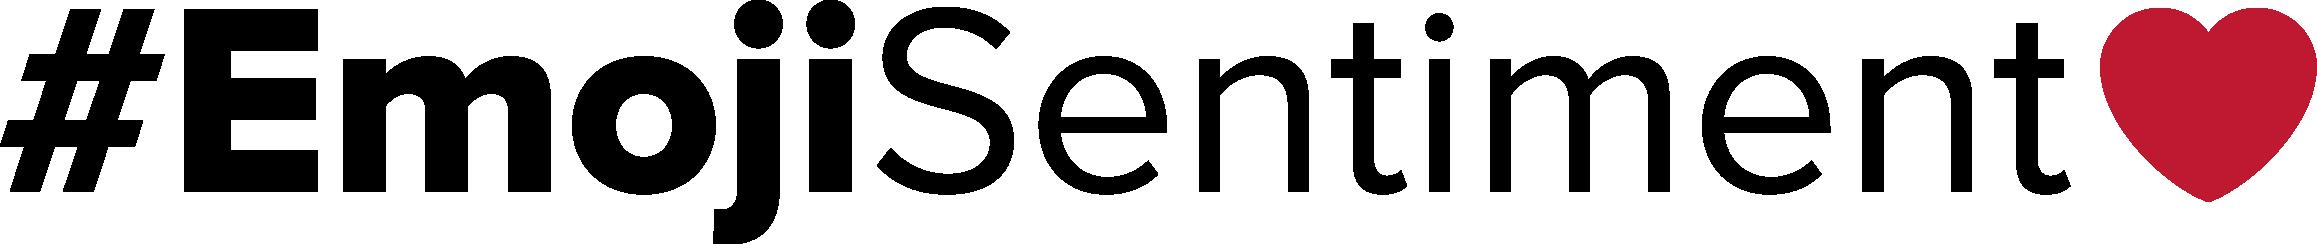 EmojiSentiment_logo